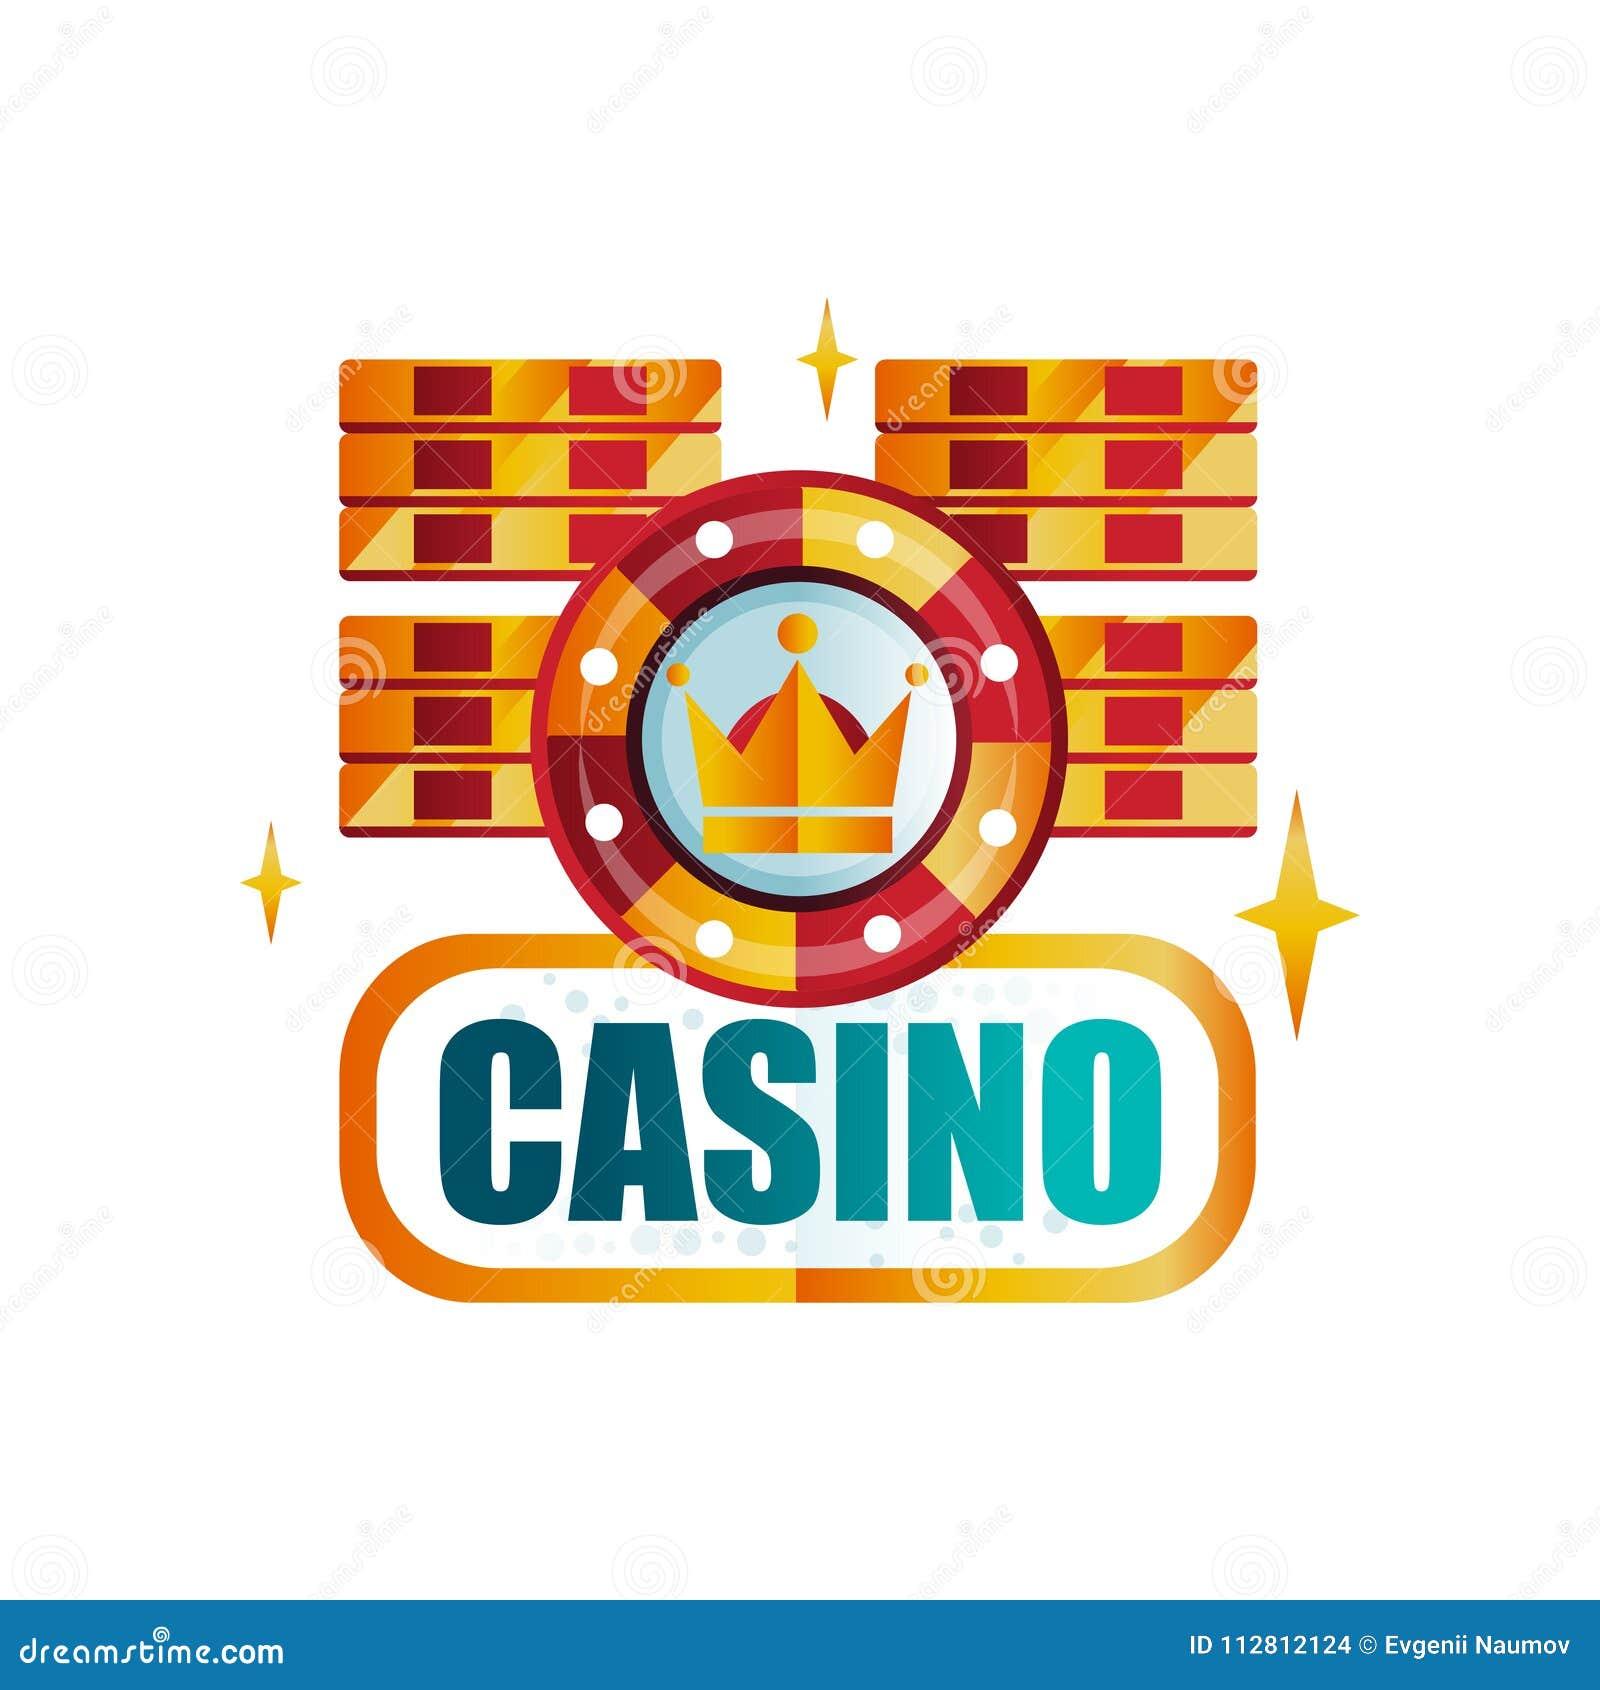 Casino colors gambling slot floor person duties